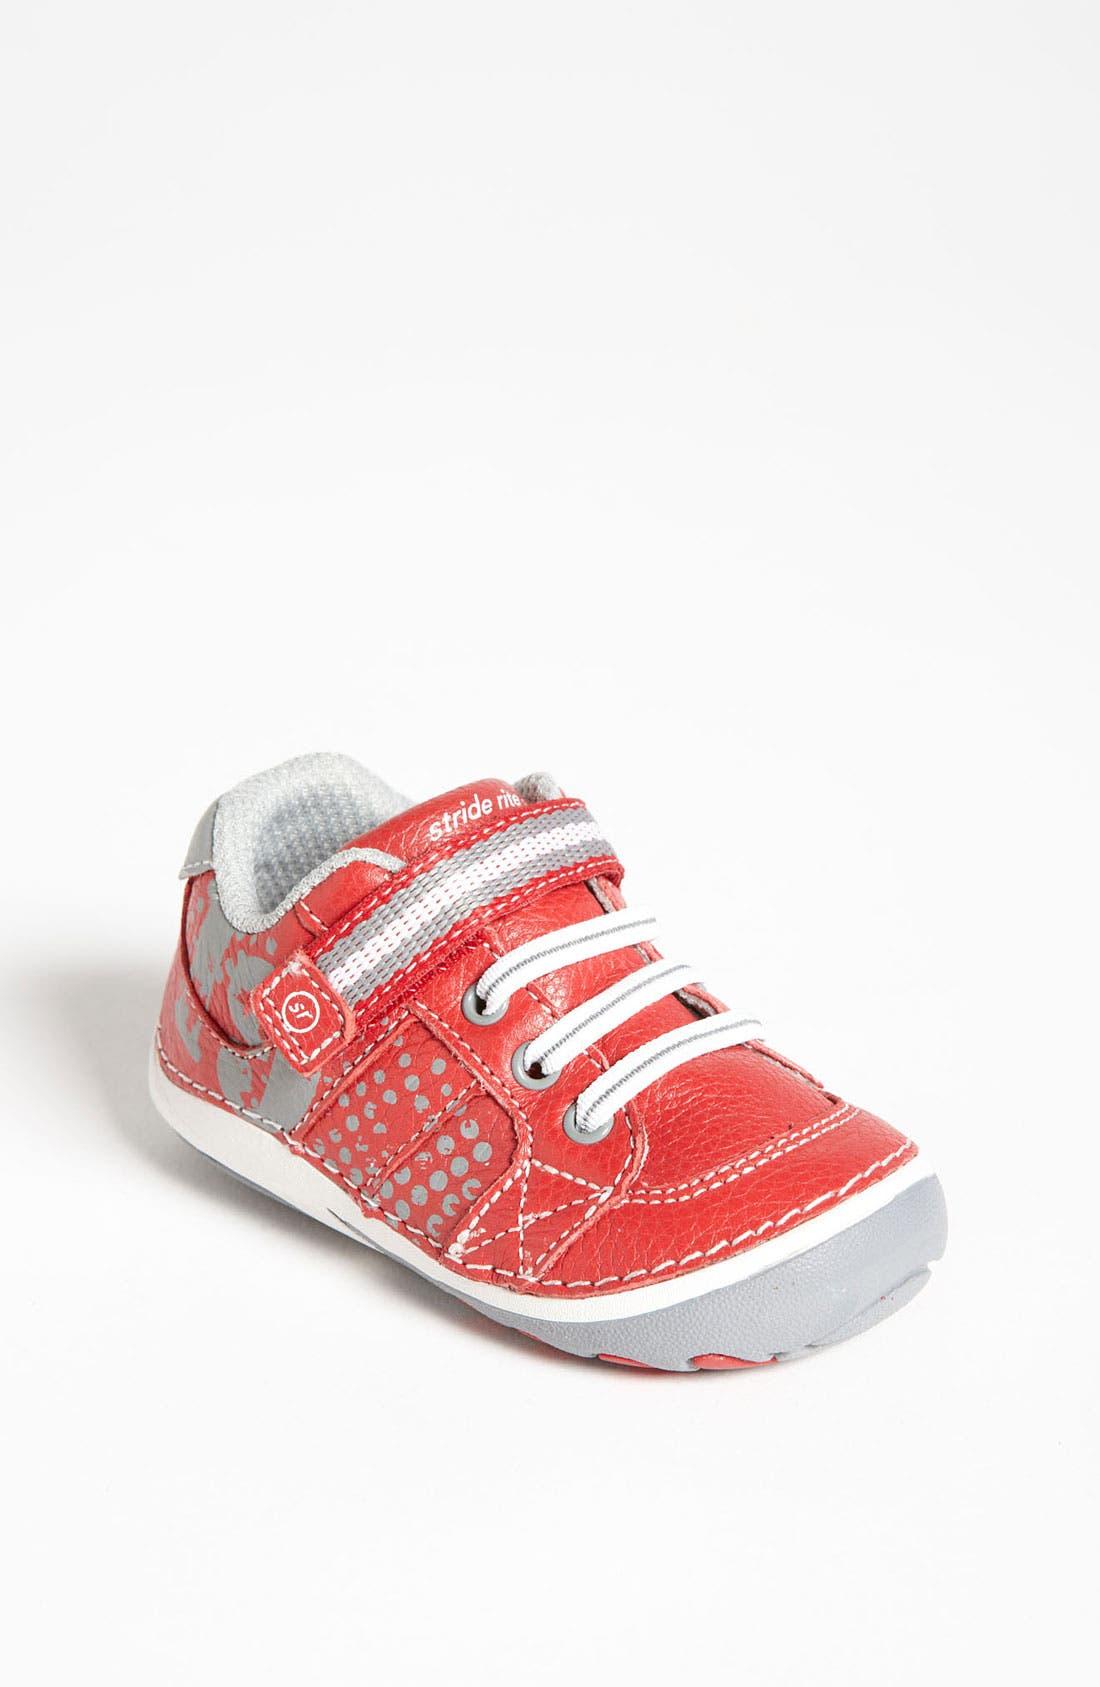 Alternate Image 1 Selected - Stride Rite 'Artie' Sneaker (Baby & Walker)